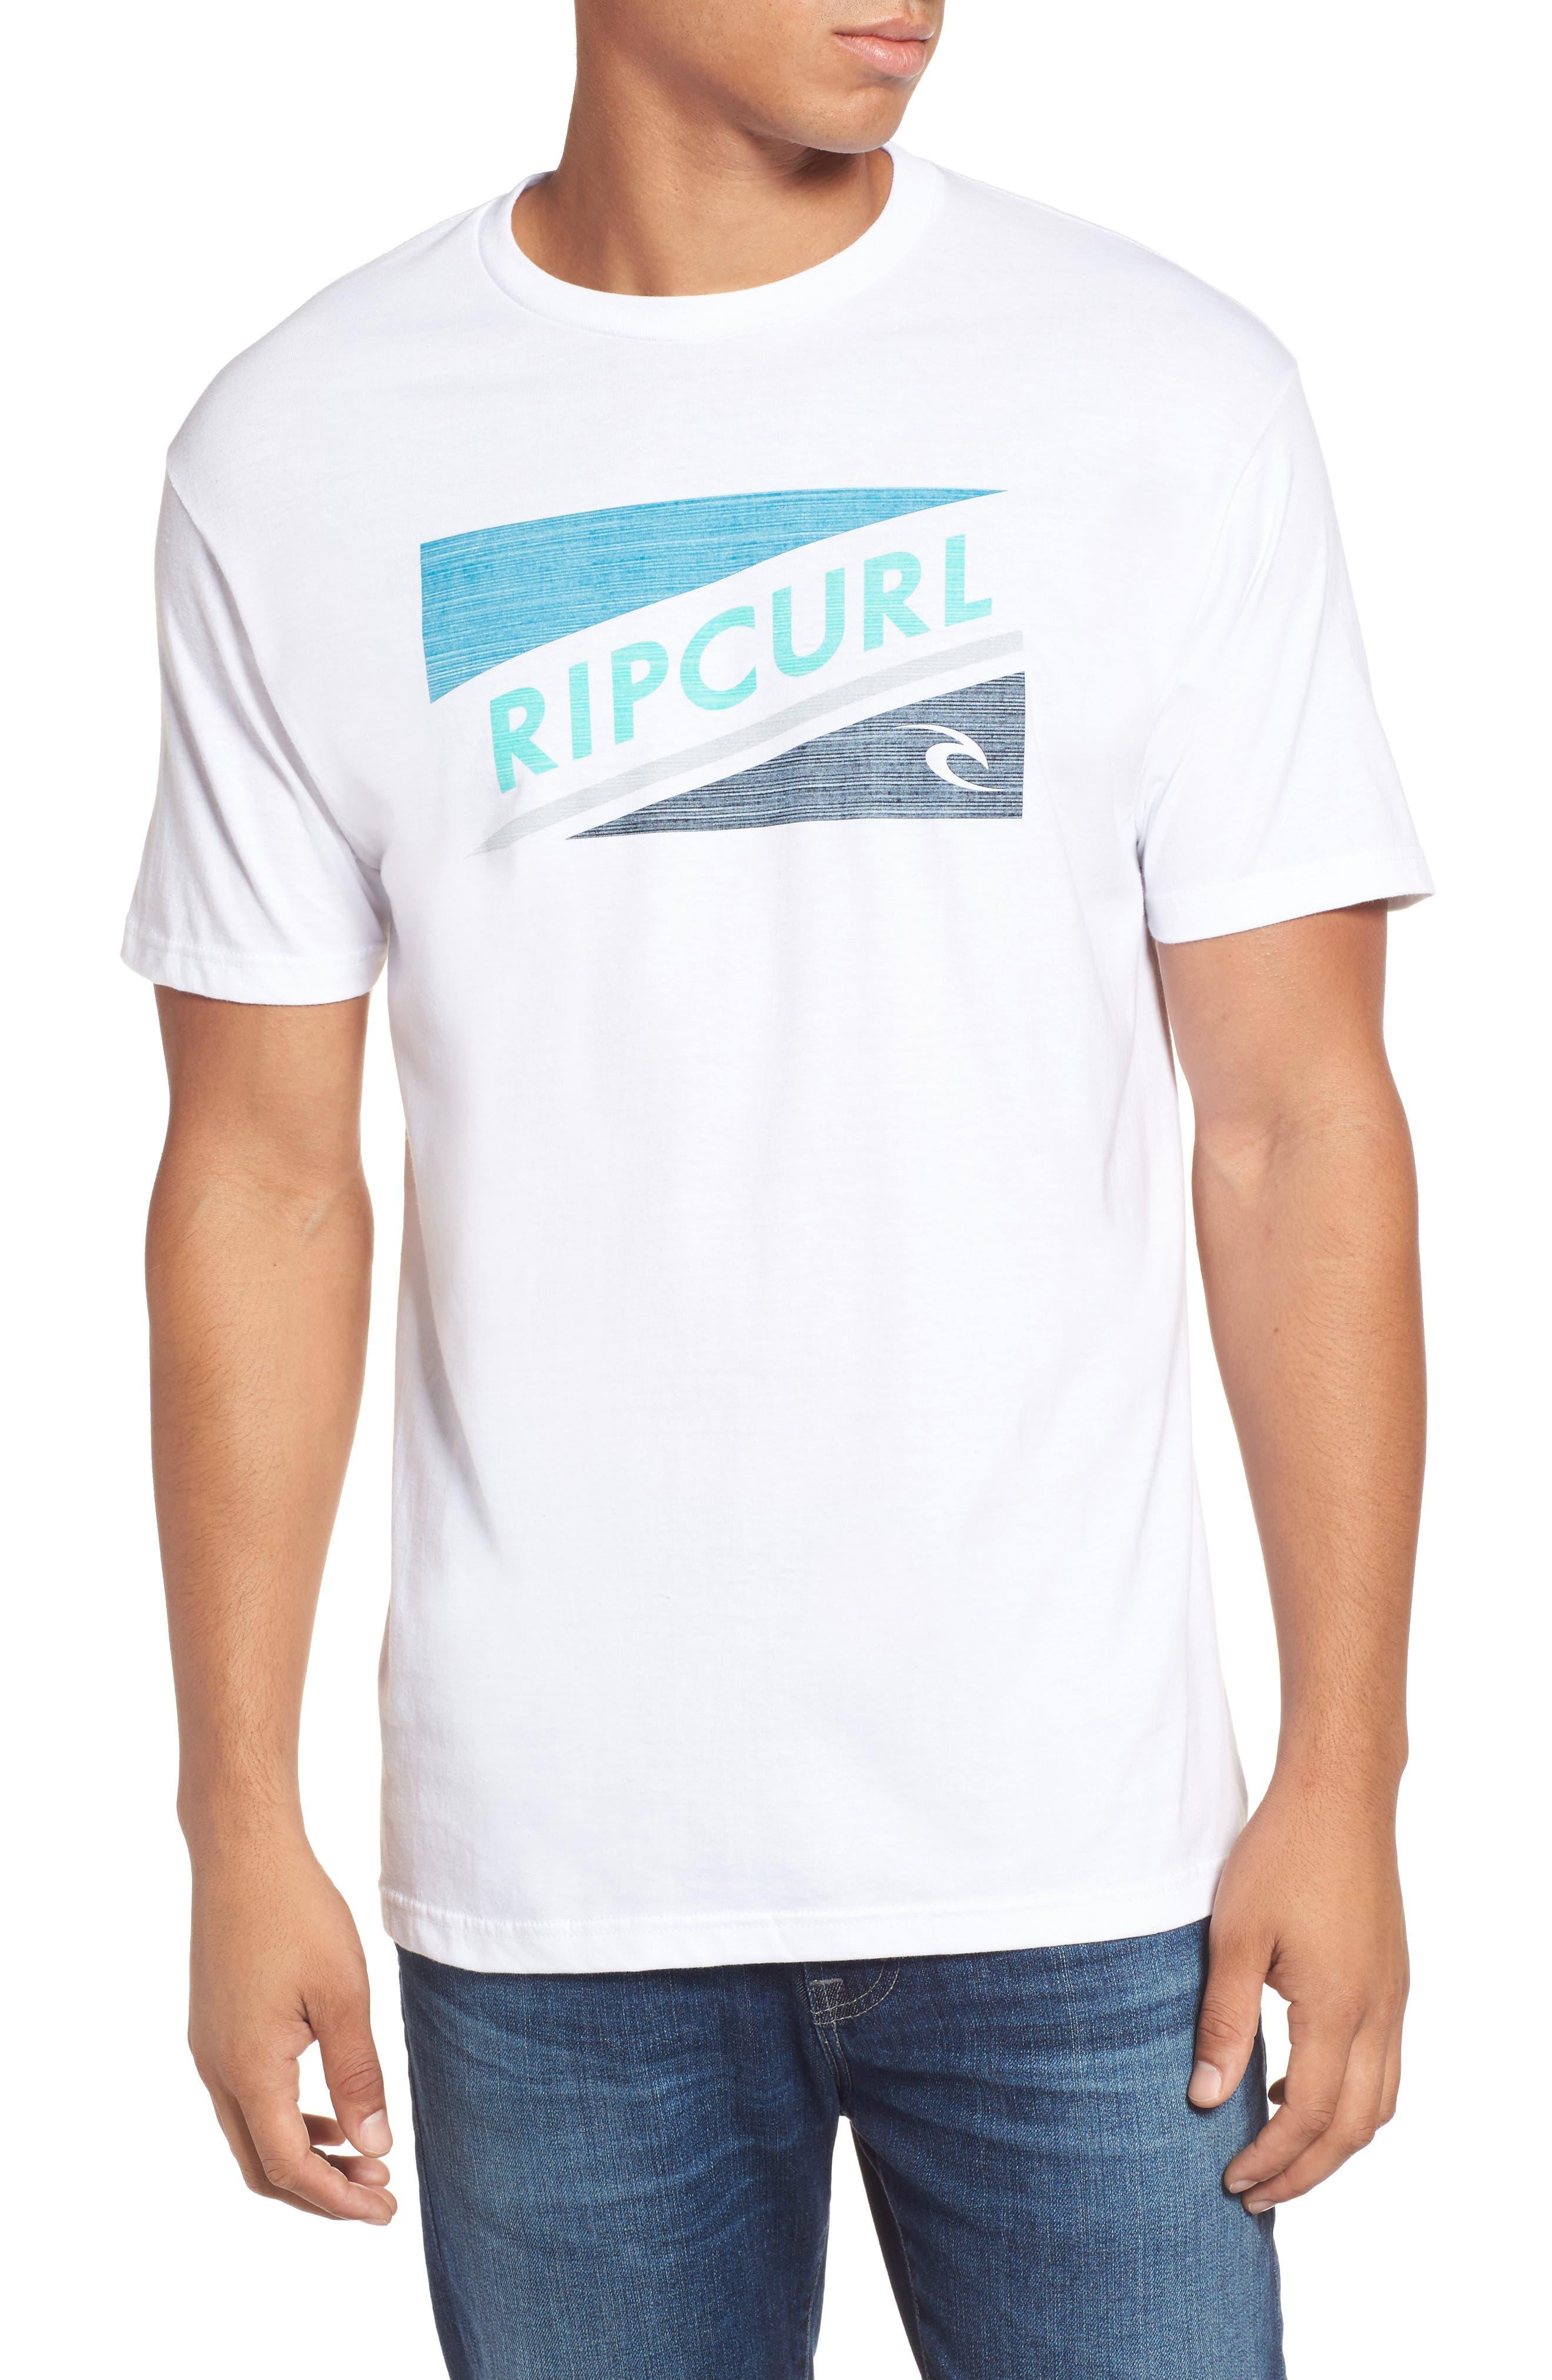 Rip Curl Racks Premium Graphic T-Shirt